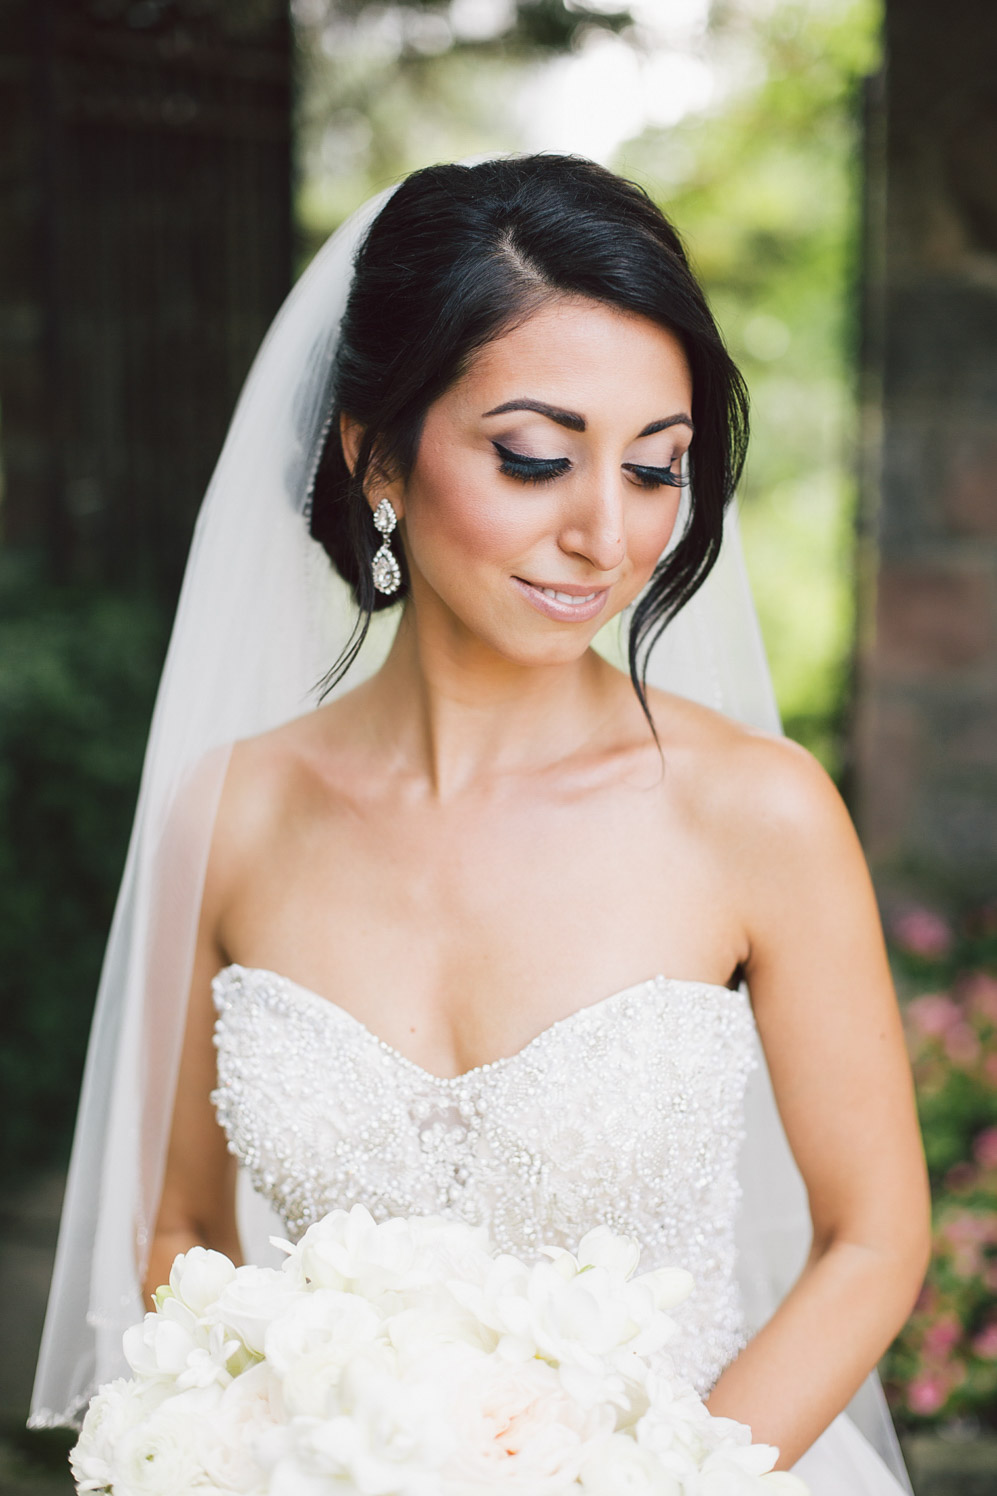 Samira's wedding photos